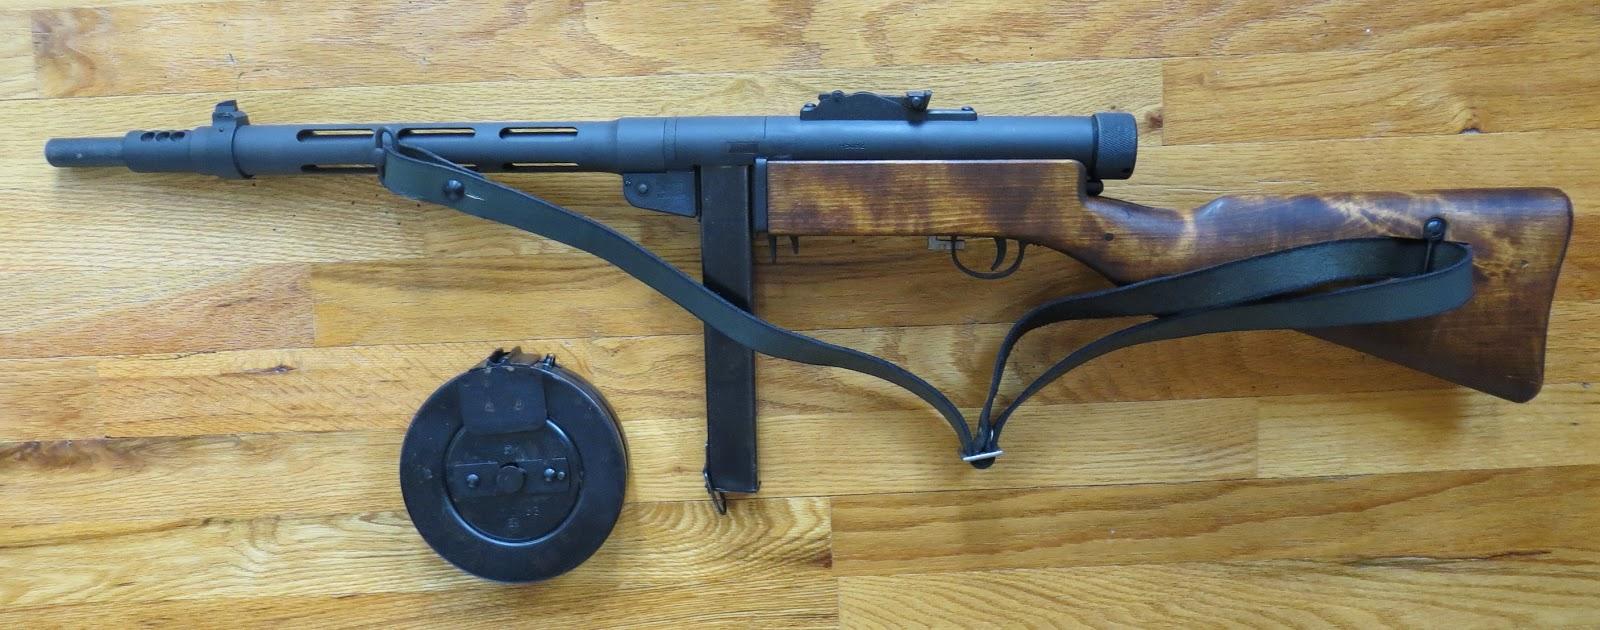 Armed But Not Dangerous Heavy Metal The Suomi Kp31